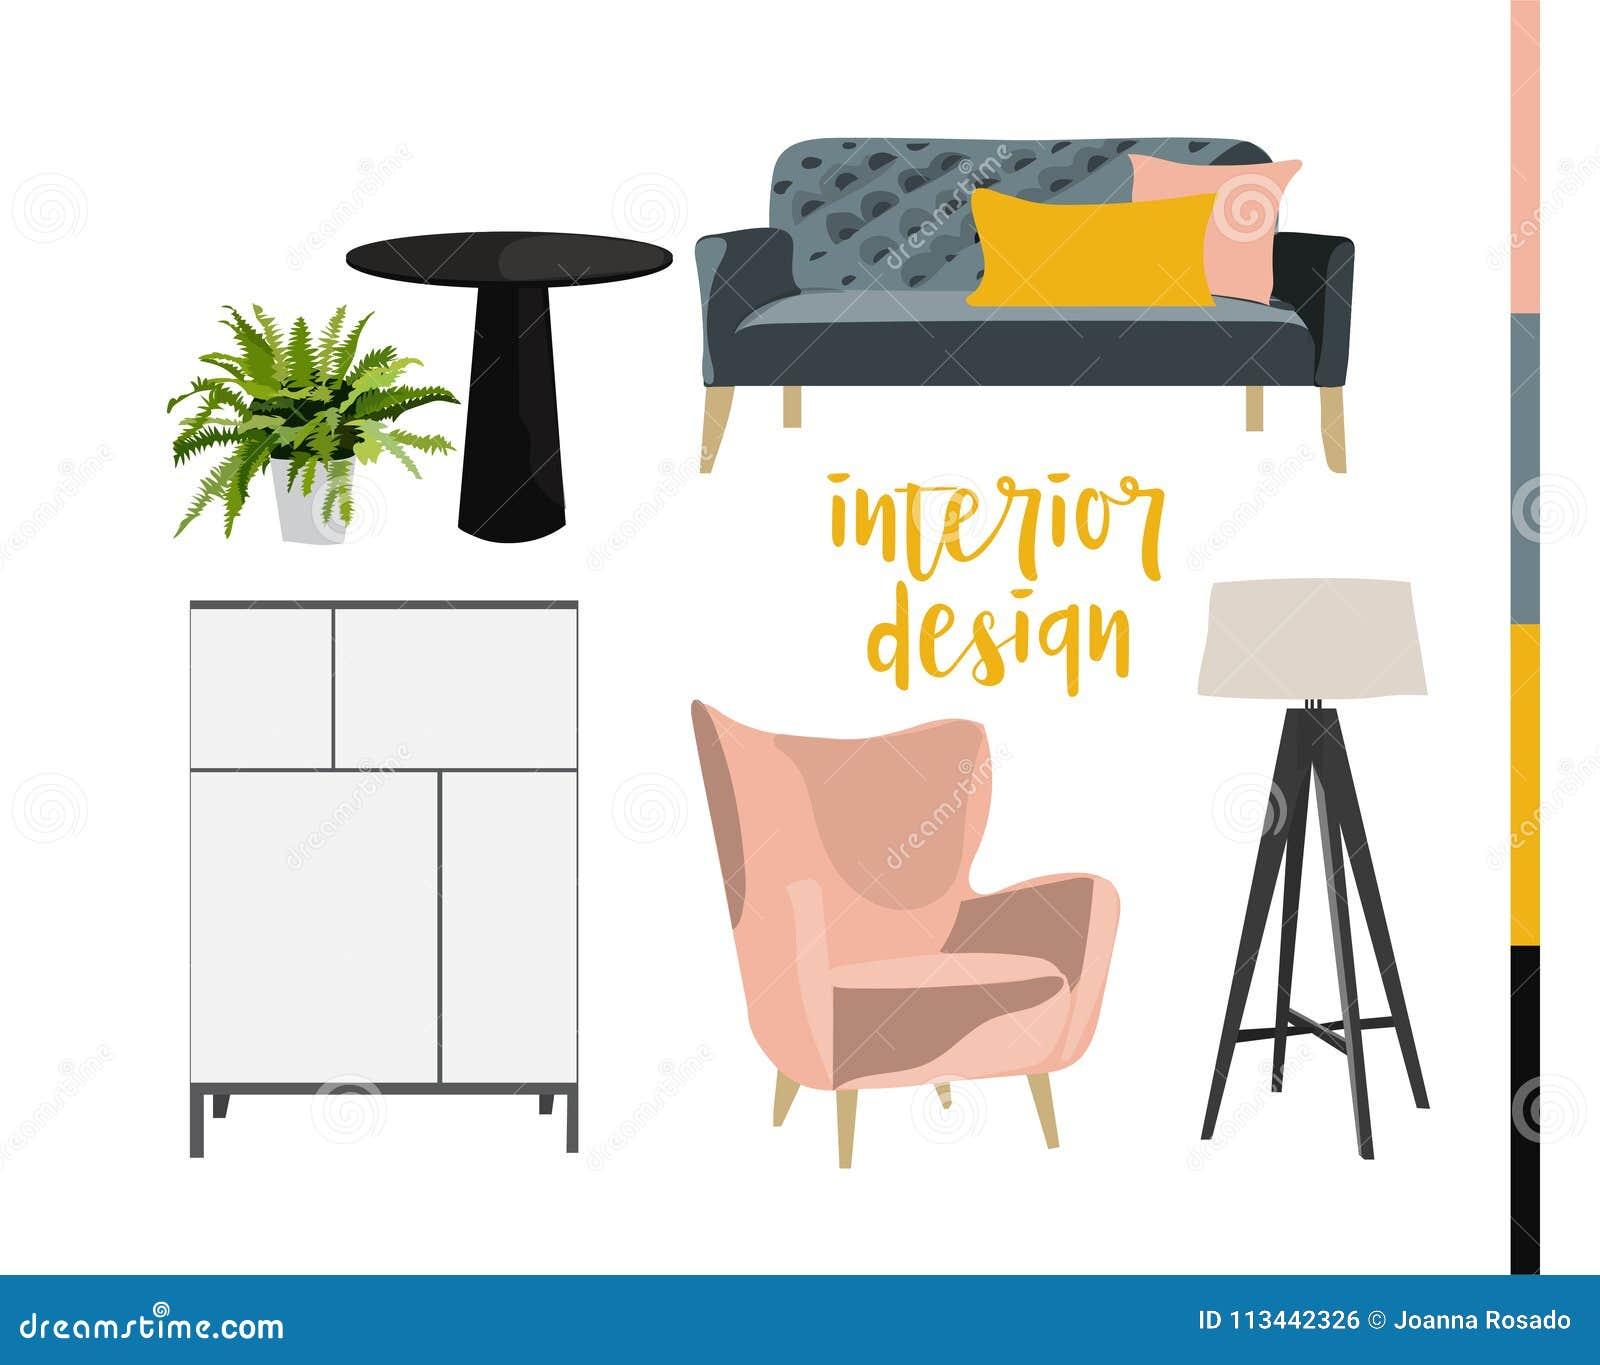 Pencil drawing of home decor mid century modern decor modern design mood board